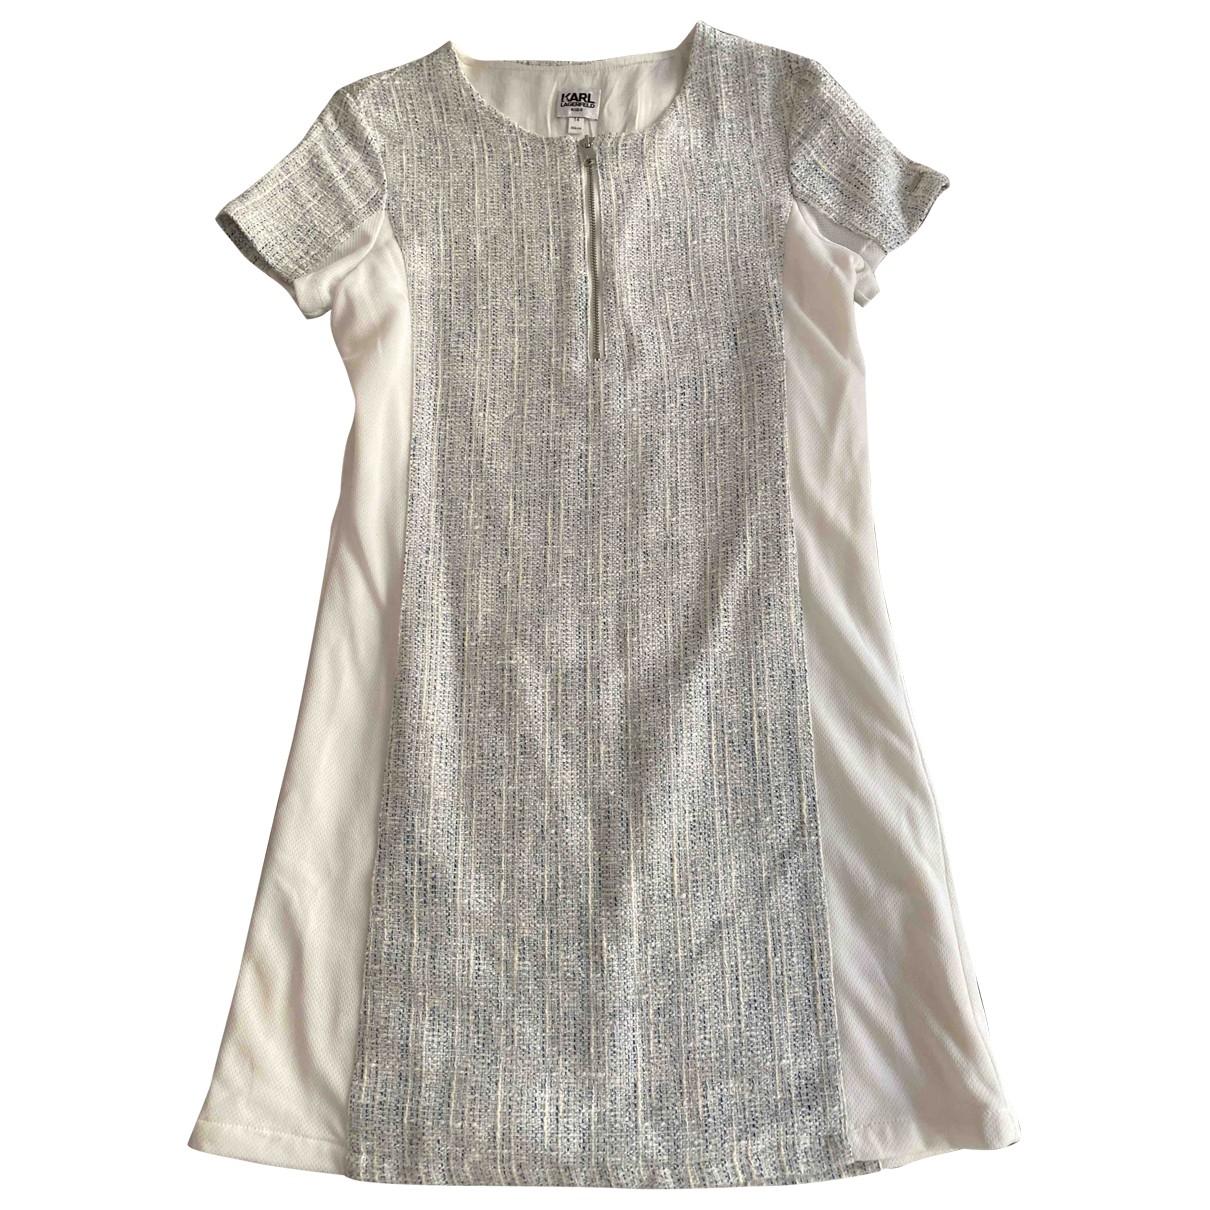 Karl Lagerfeld \N Blue Cotton dress for Kids 14 years - S FR